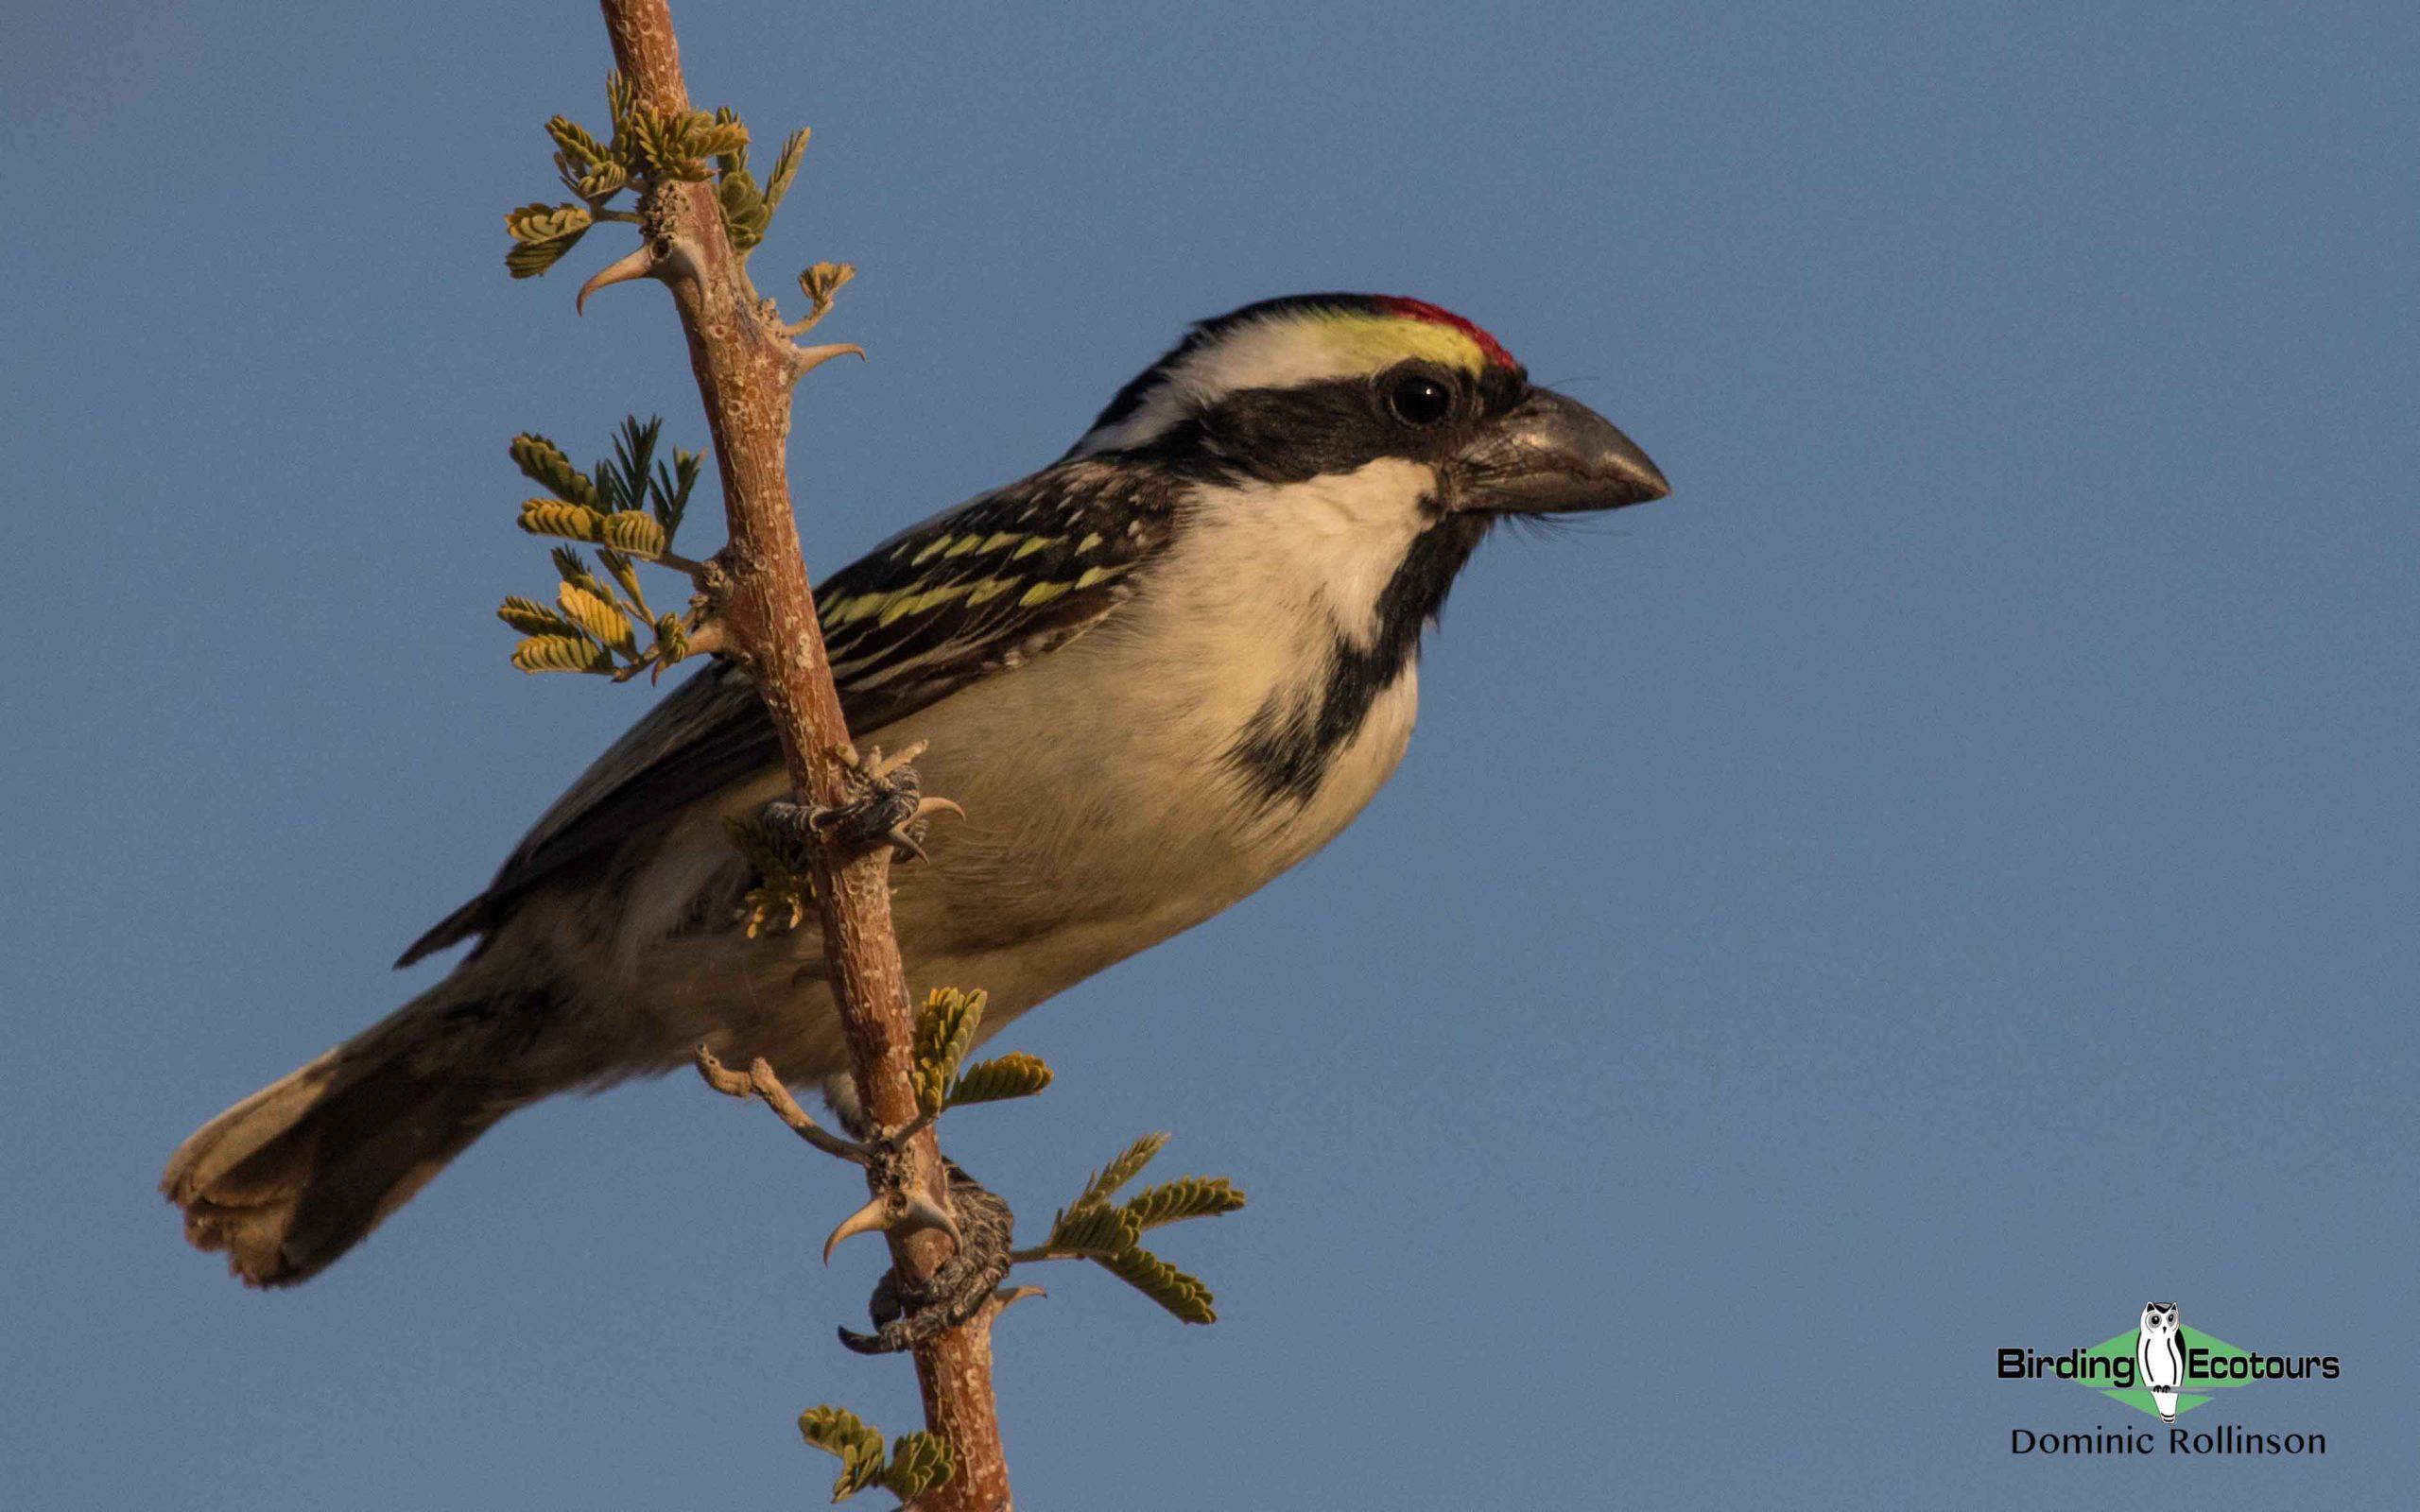 Okavango birding tours